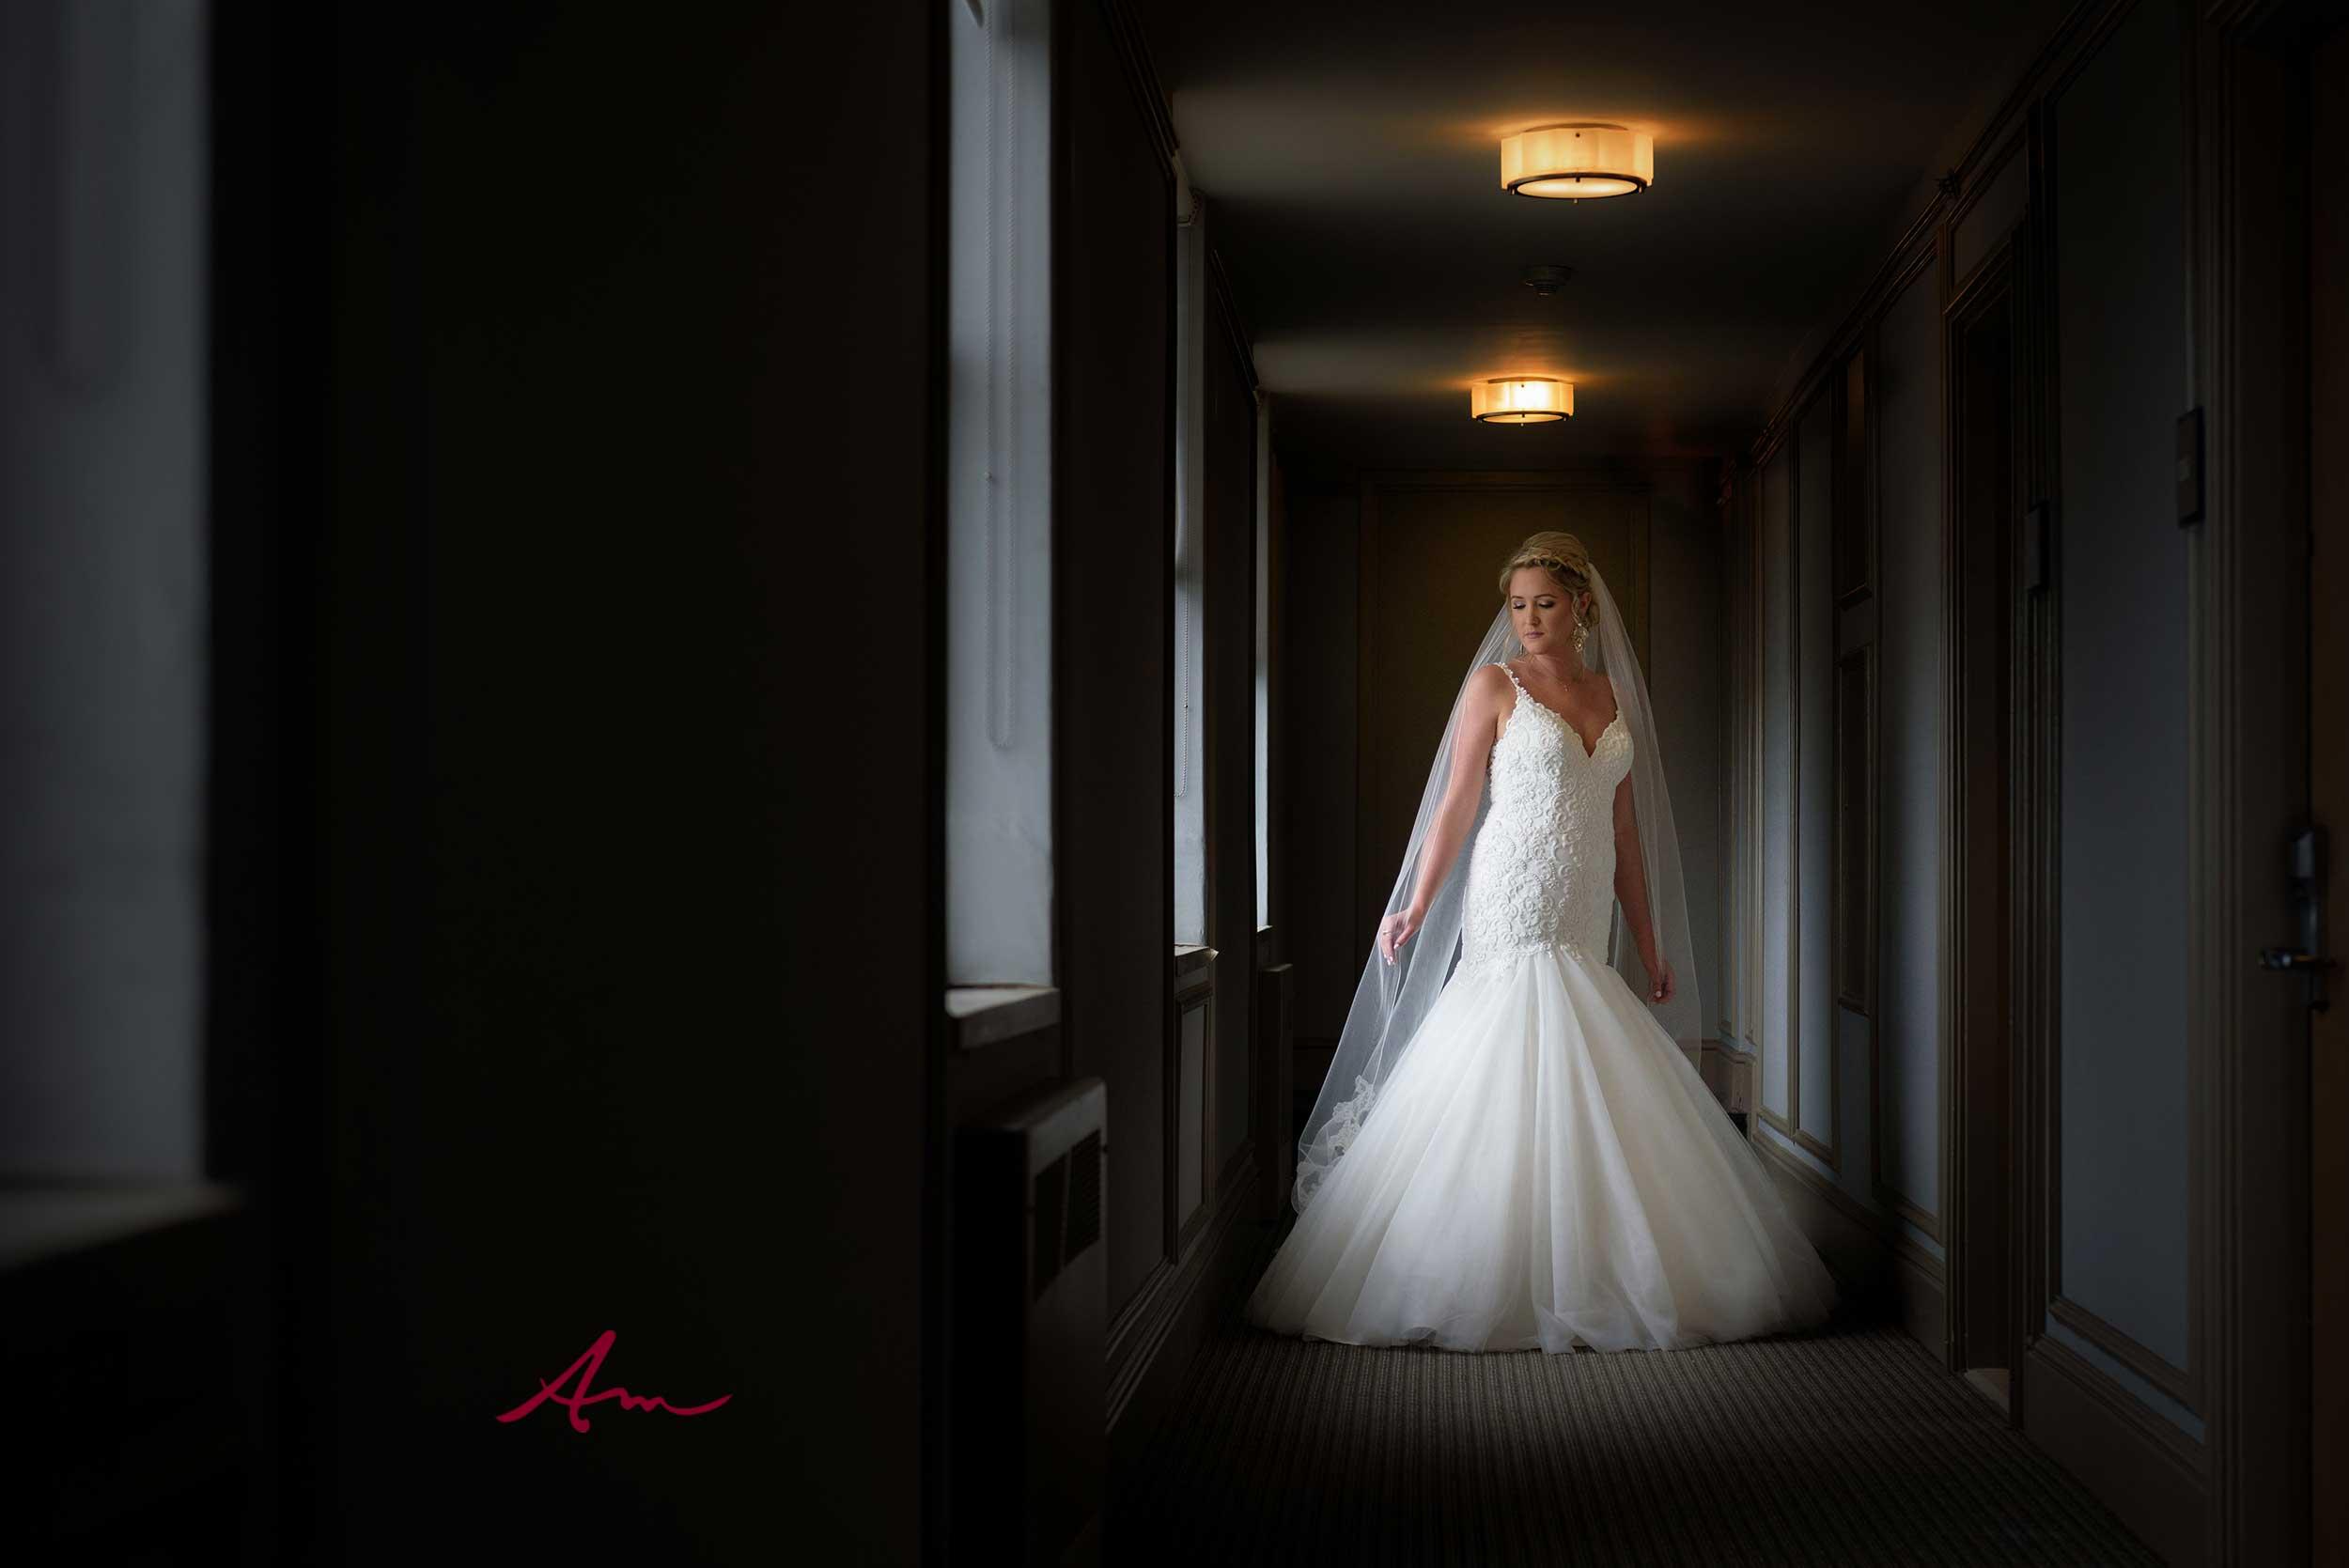 halifax-bride-westin-hallway.jpg